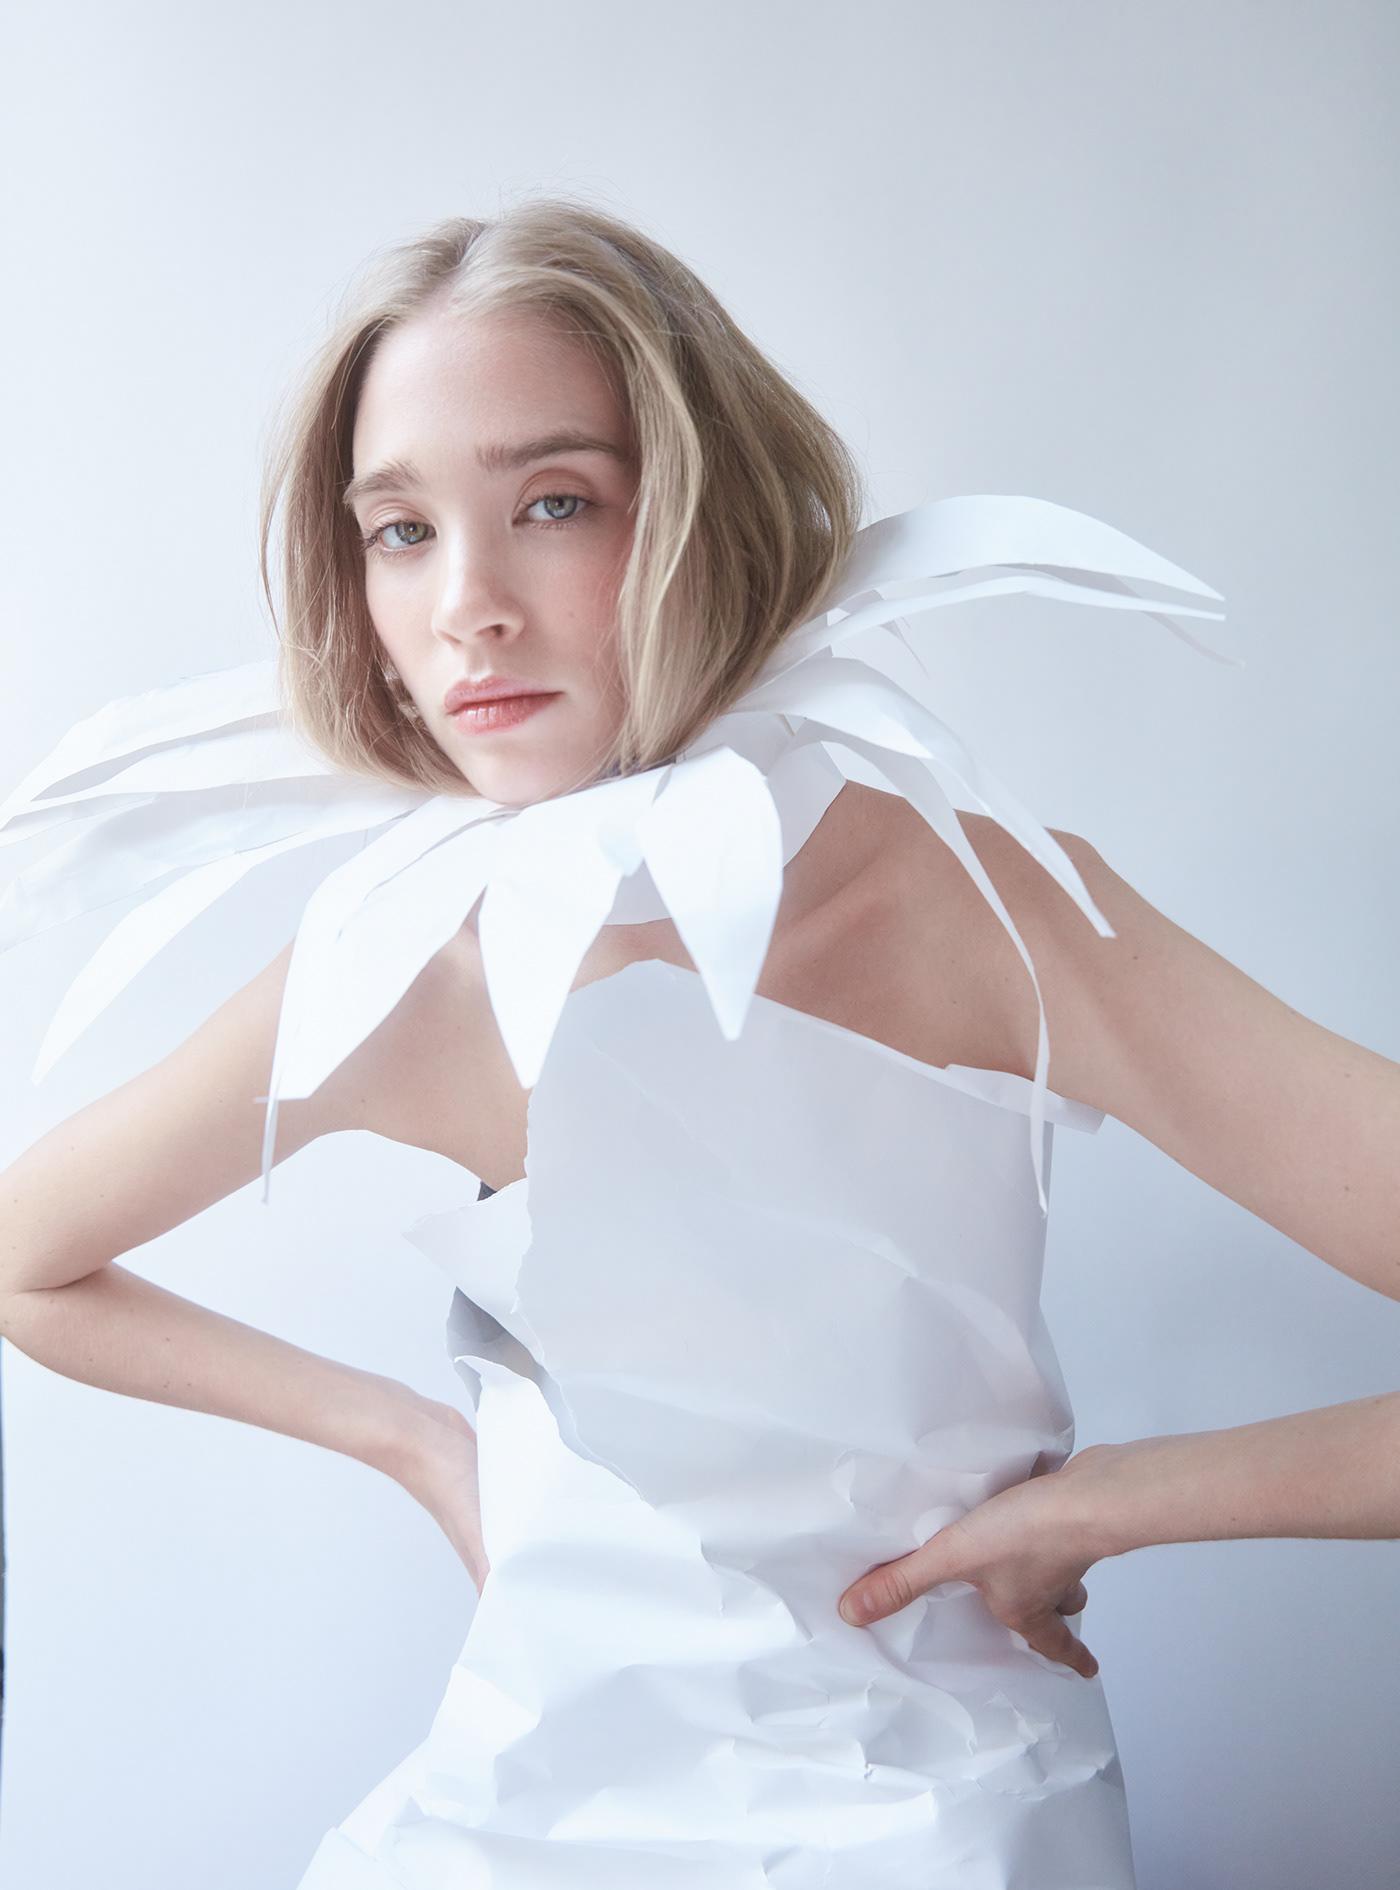 blond daisy Fashion  flower model paper Paris White